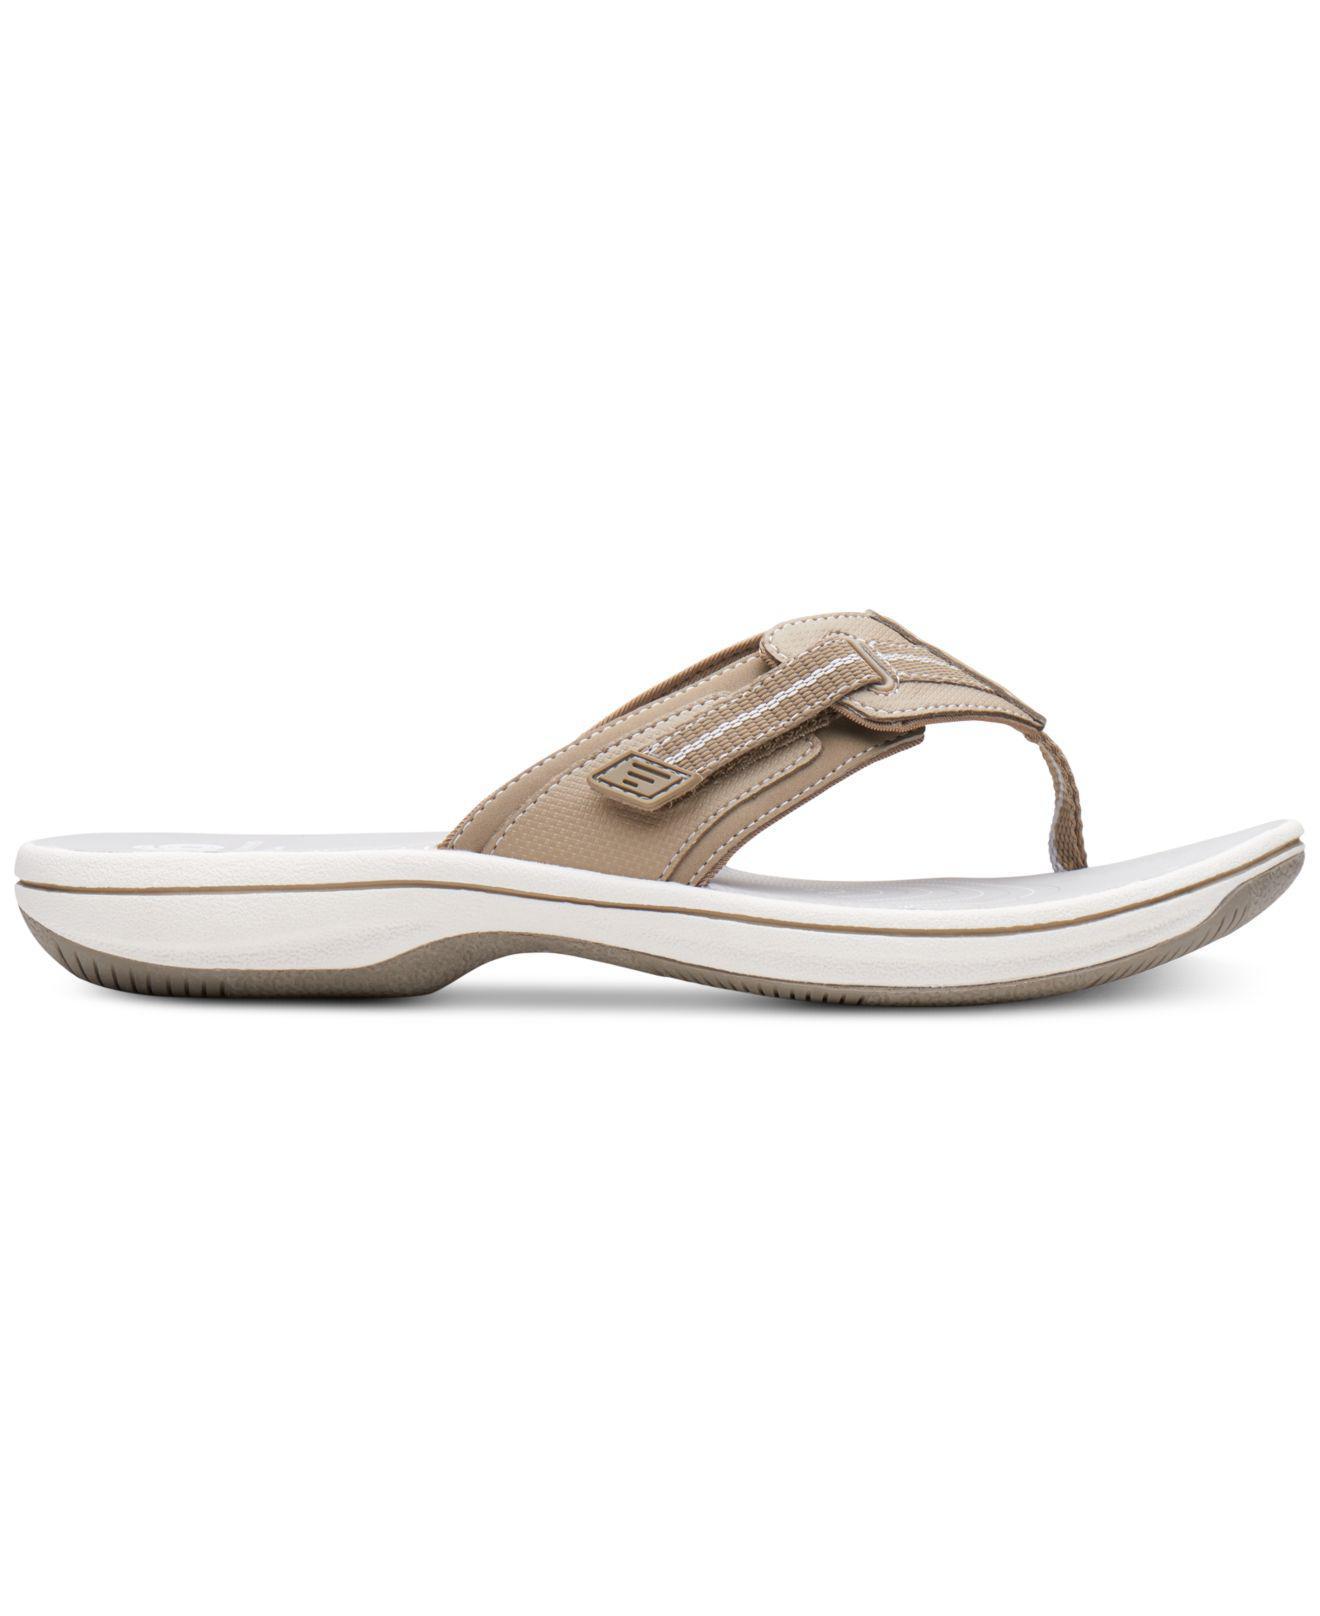 25116faba30 Clarks brinkley jazz womens sandals women s shoes